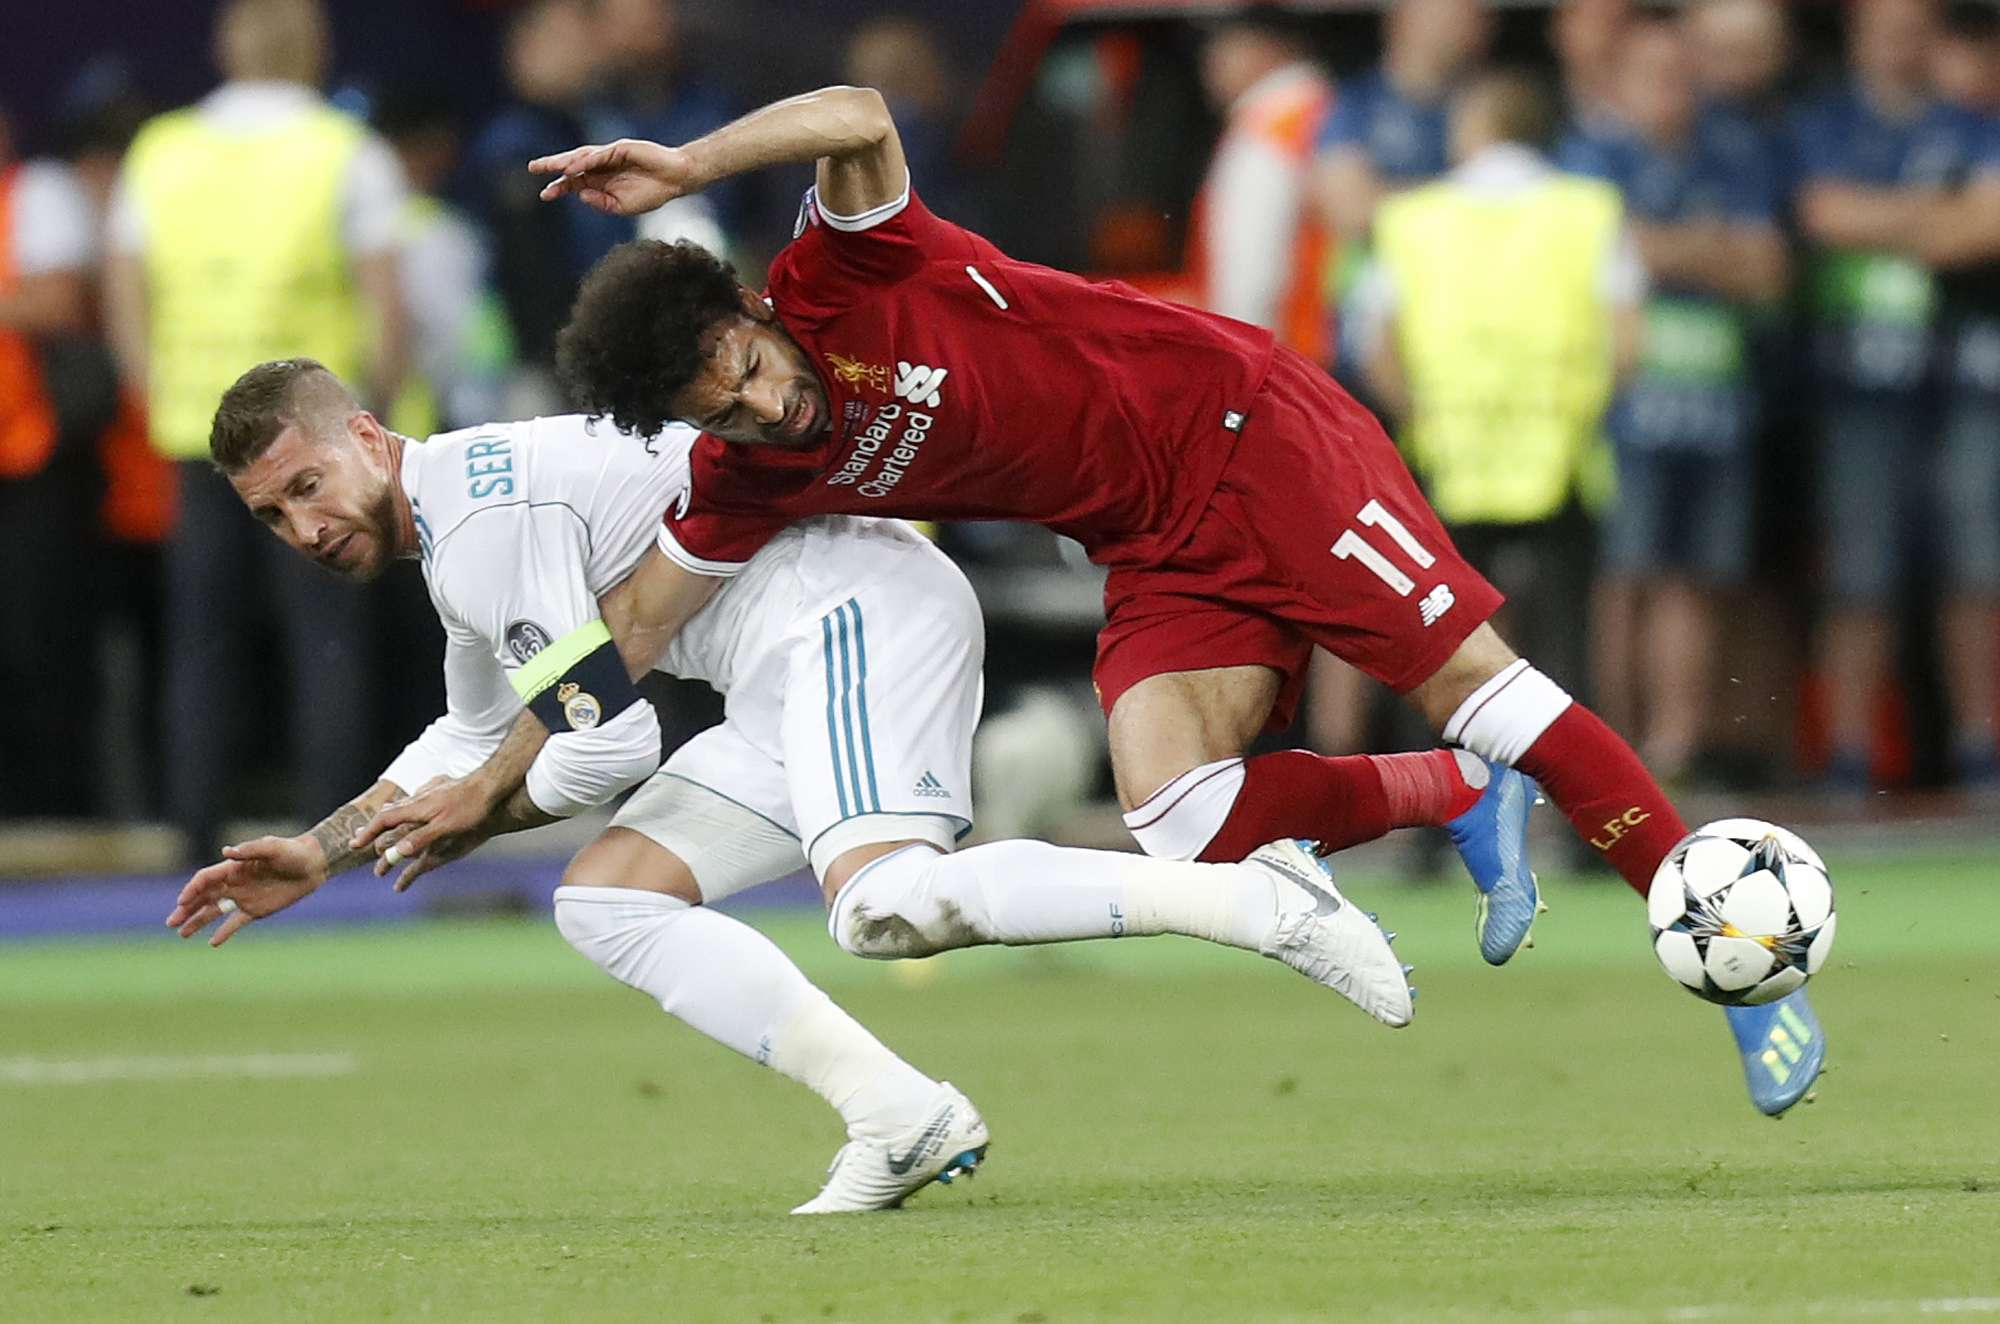 El jugador Mohamed Salah. Foto: AP